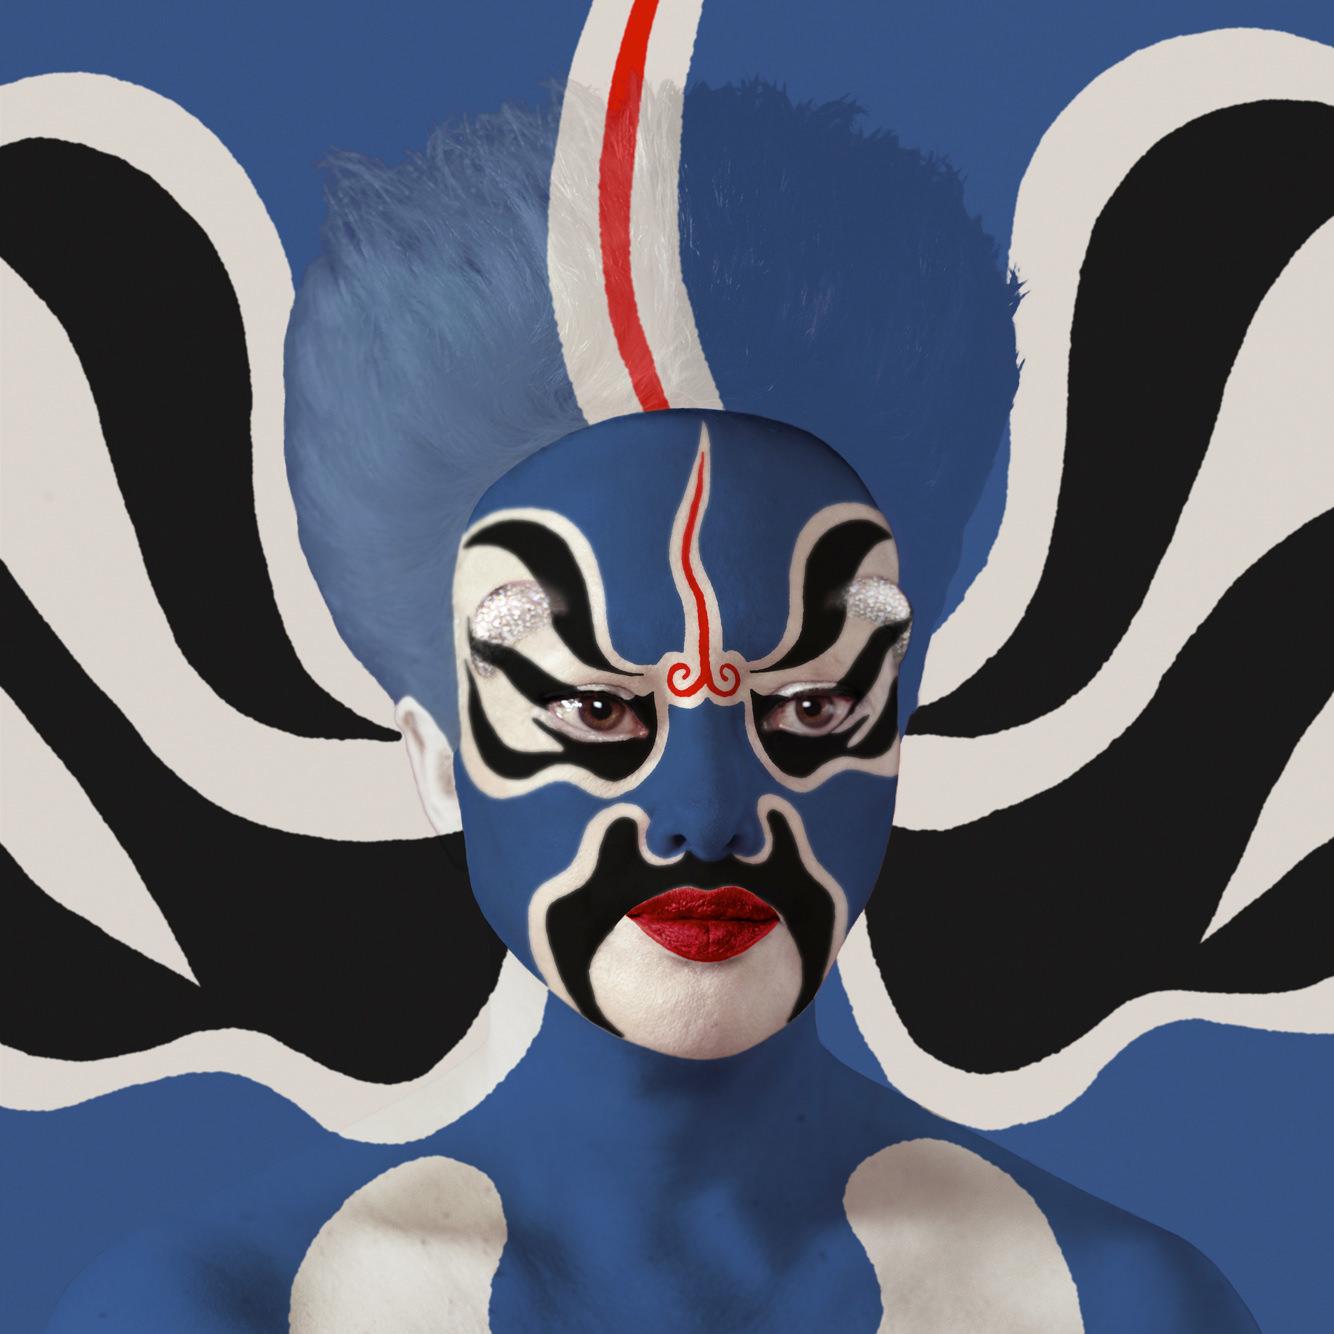 Masques Pékin Opéra, Facing Designs et réalité augmentée, Selfhybridation Opéra de Pékin n° 2,ORLAN.